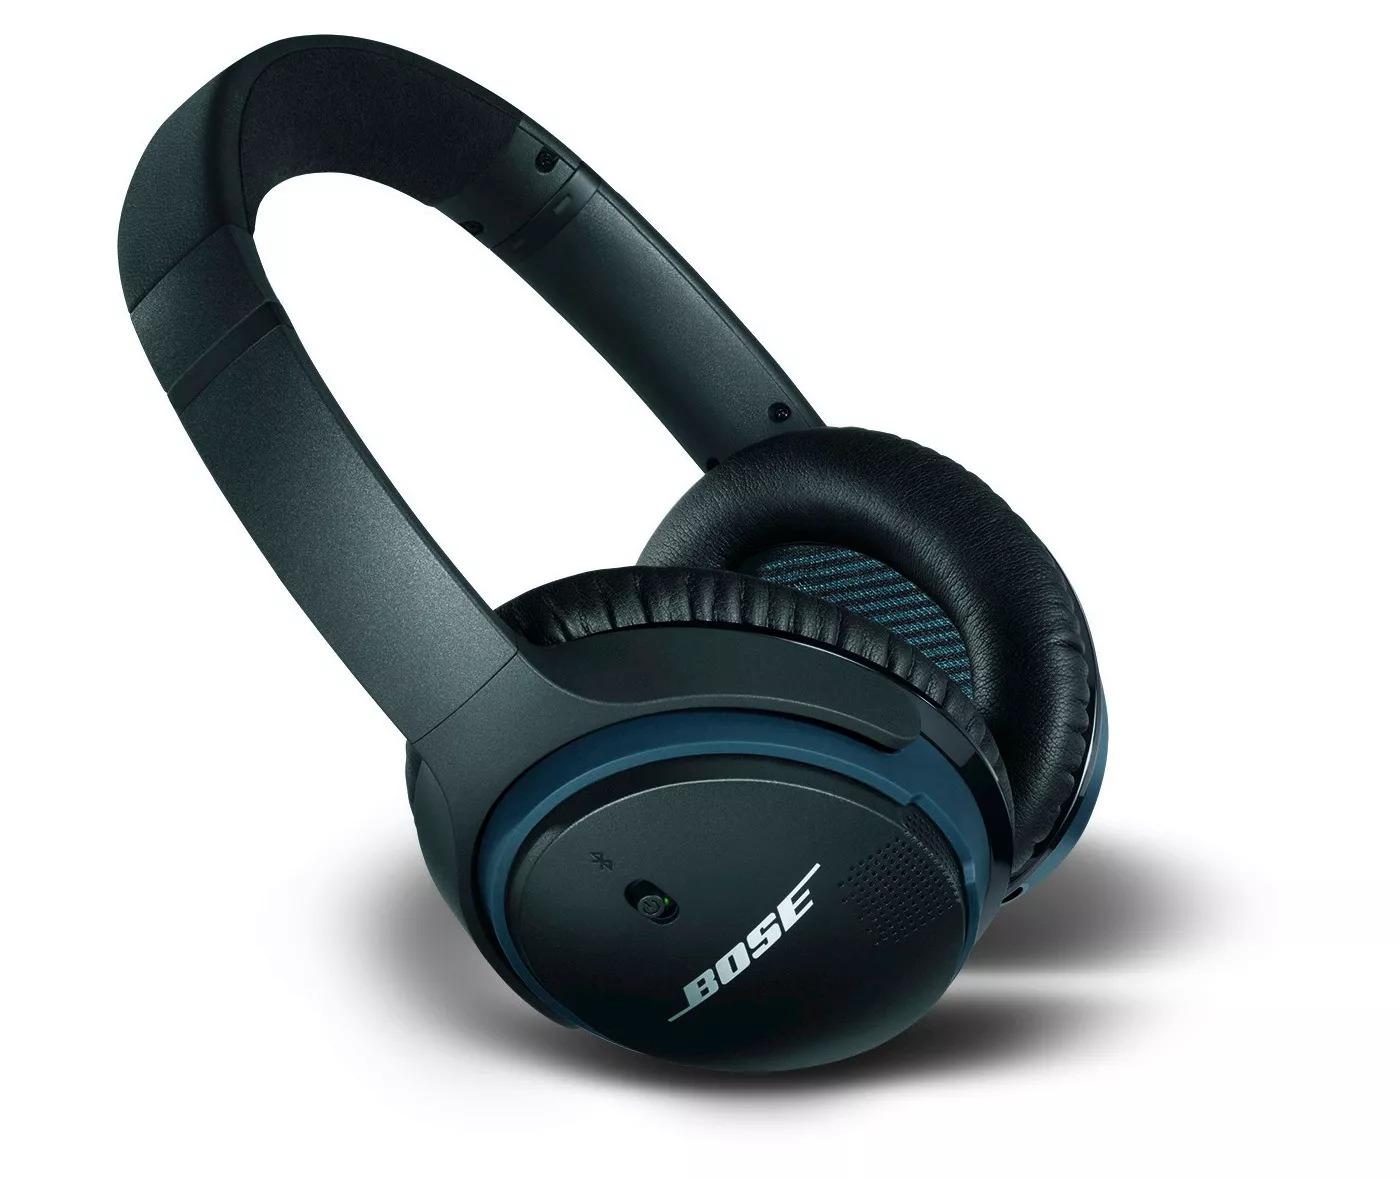 Bose Soundlink Around-Ear Wireless II Bluetooth Headphones YMMV Target $68.99